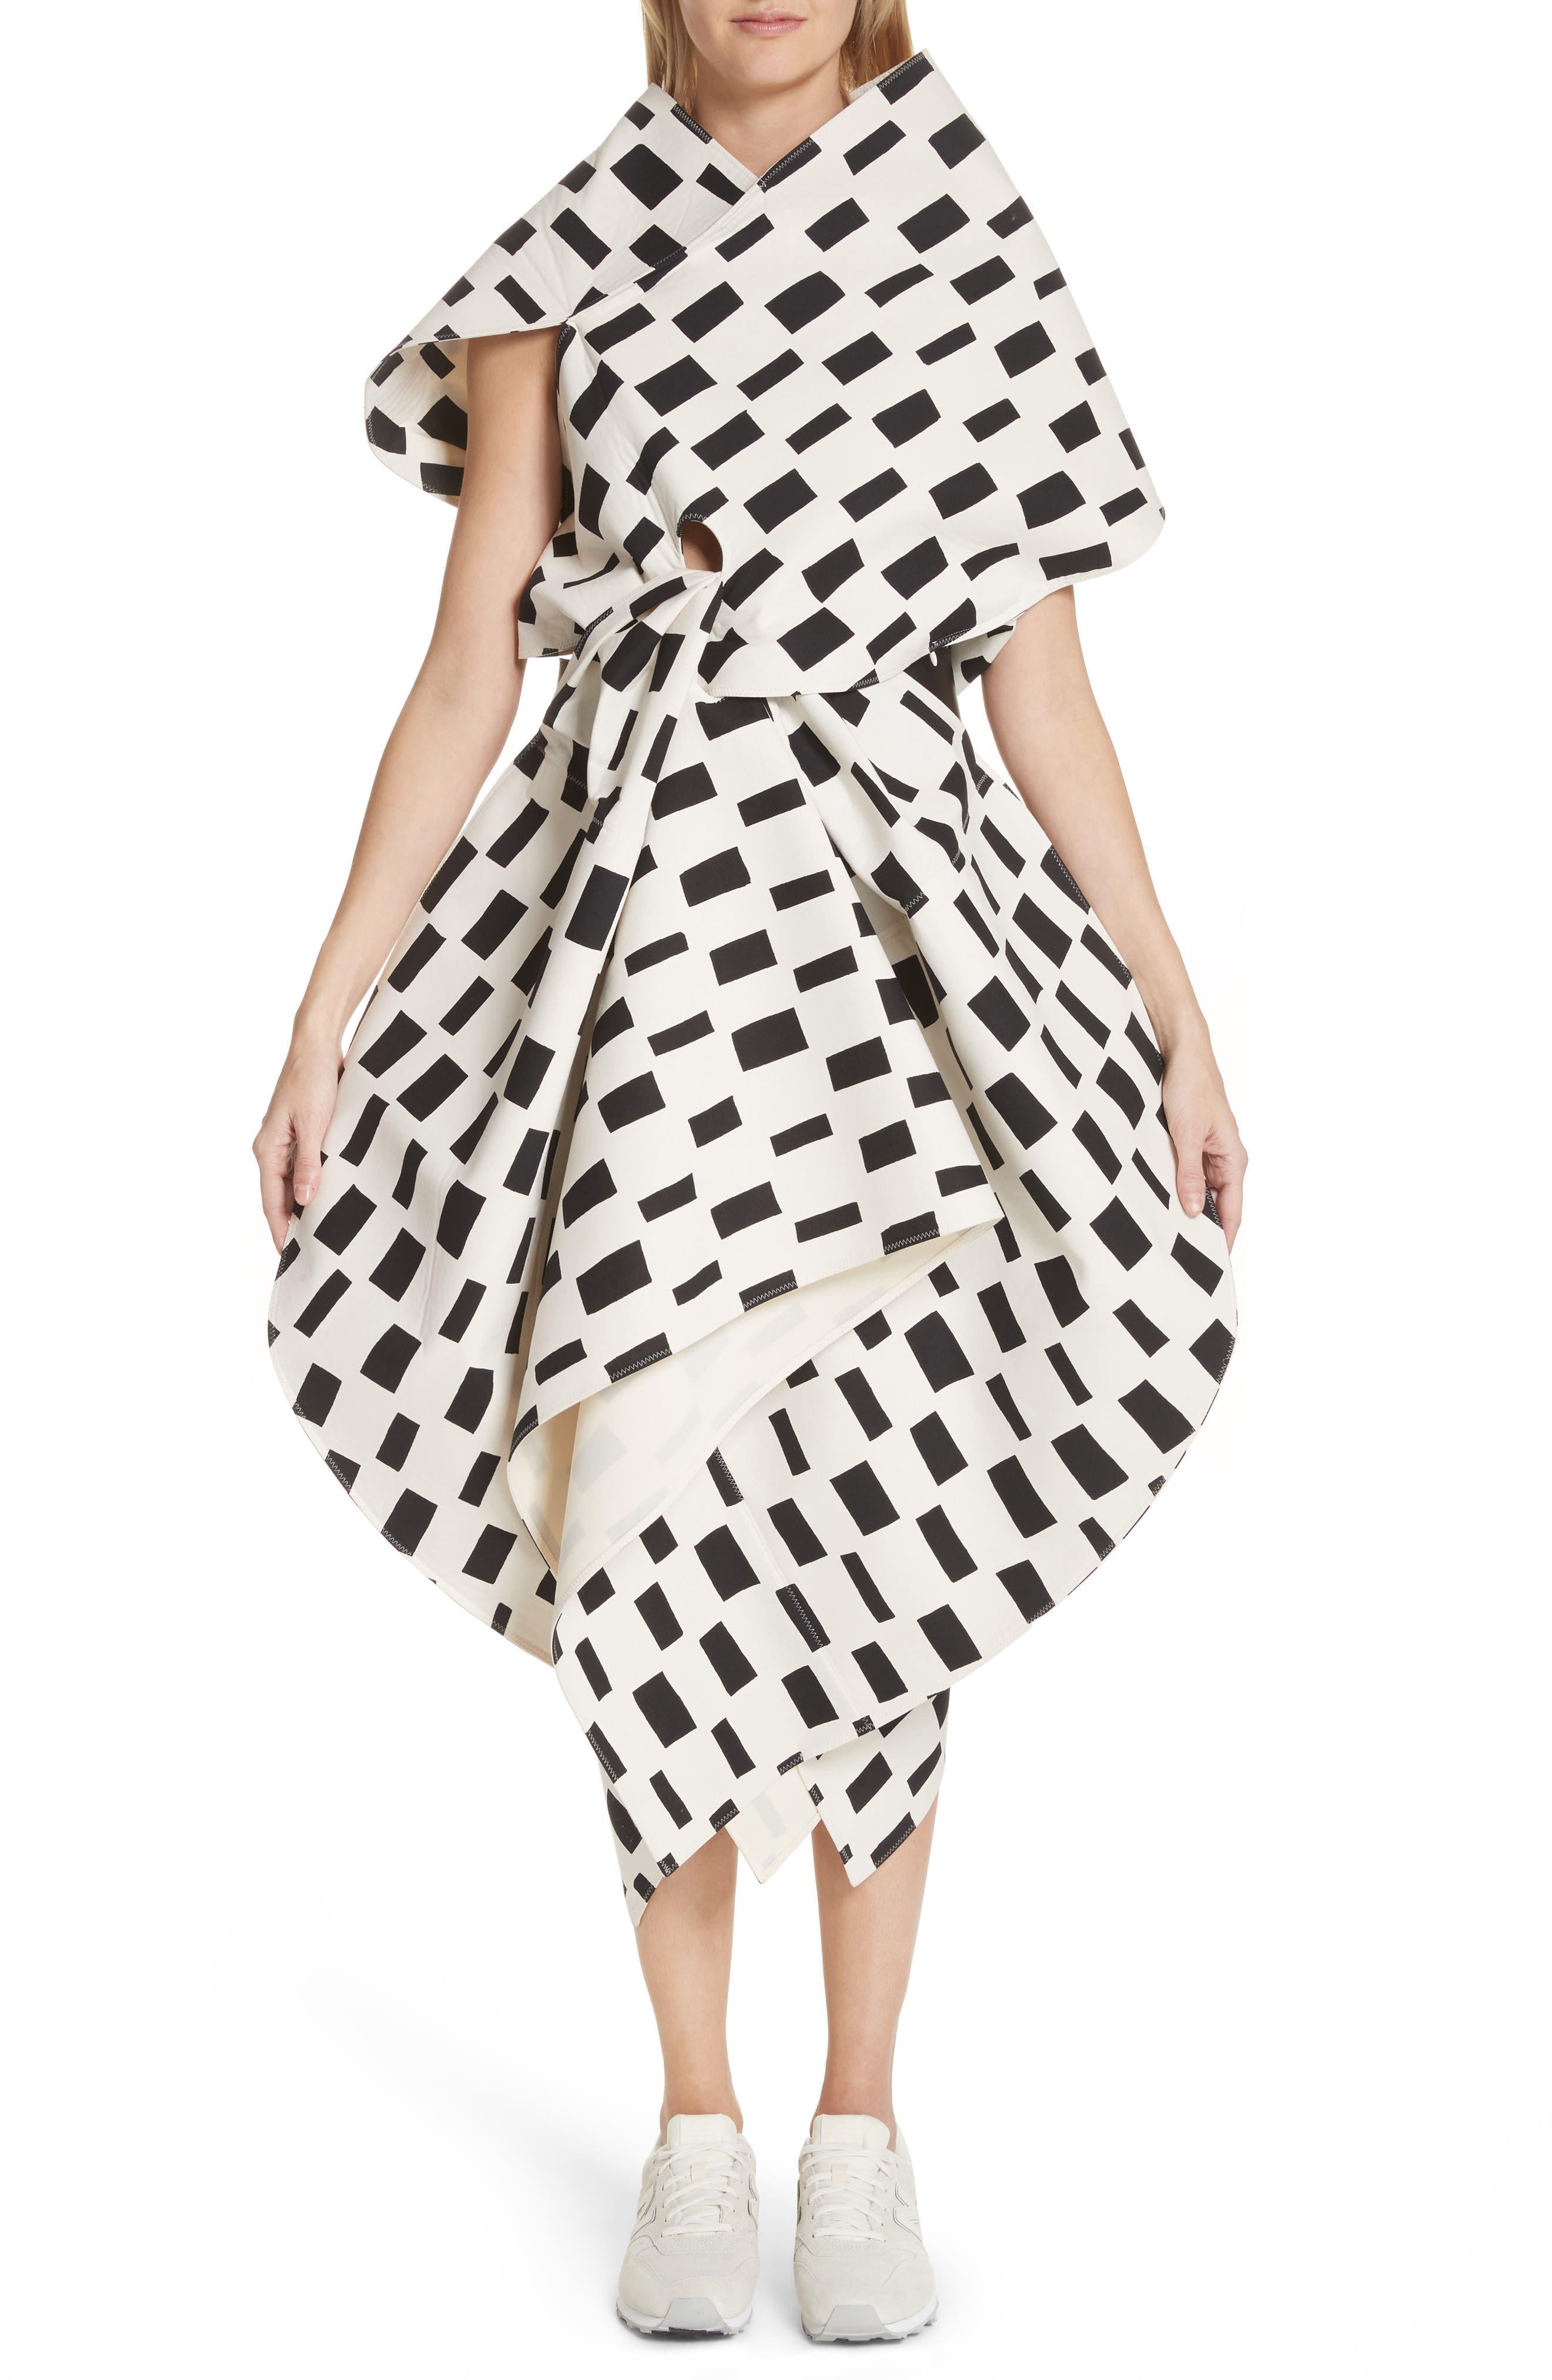 Interweave Geo Print Dress,                             Main thumbnail 1, color,                             Off White/ Black